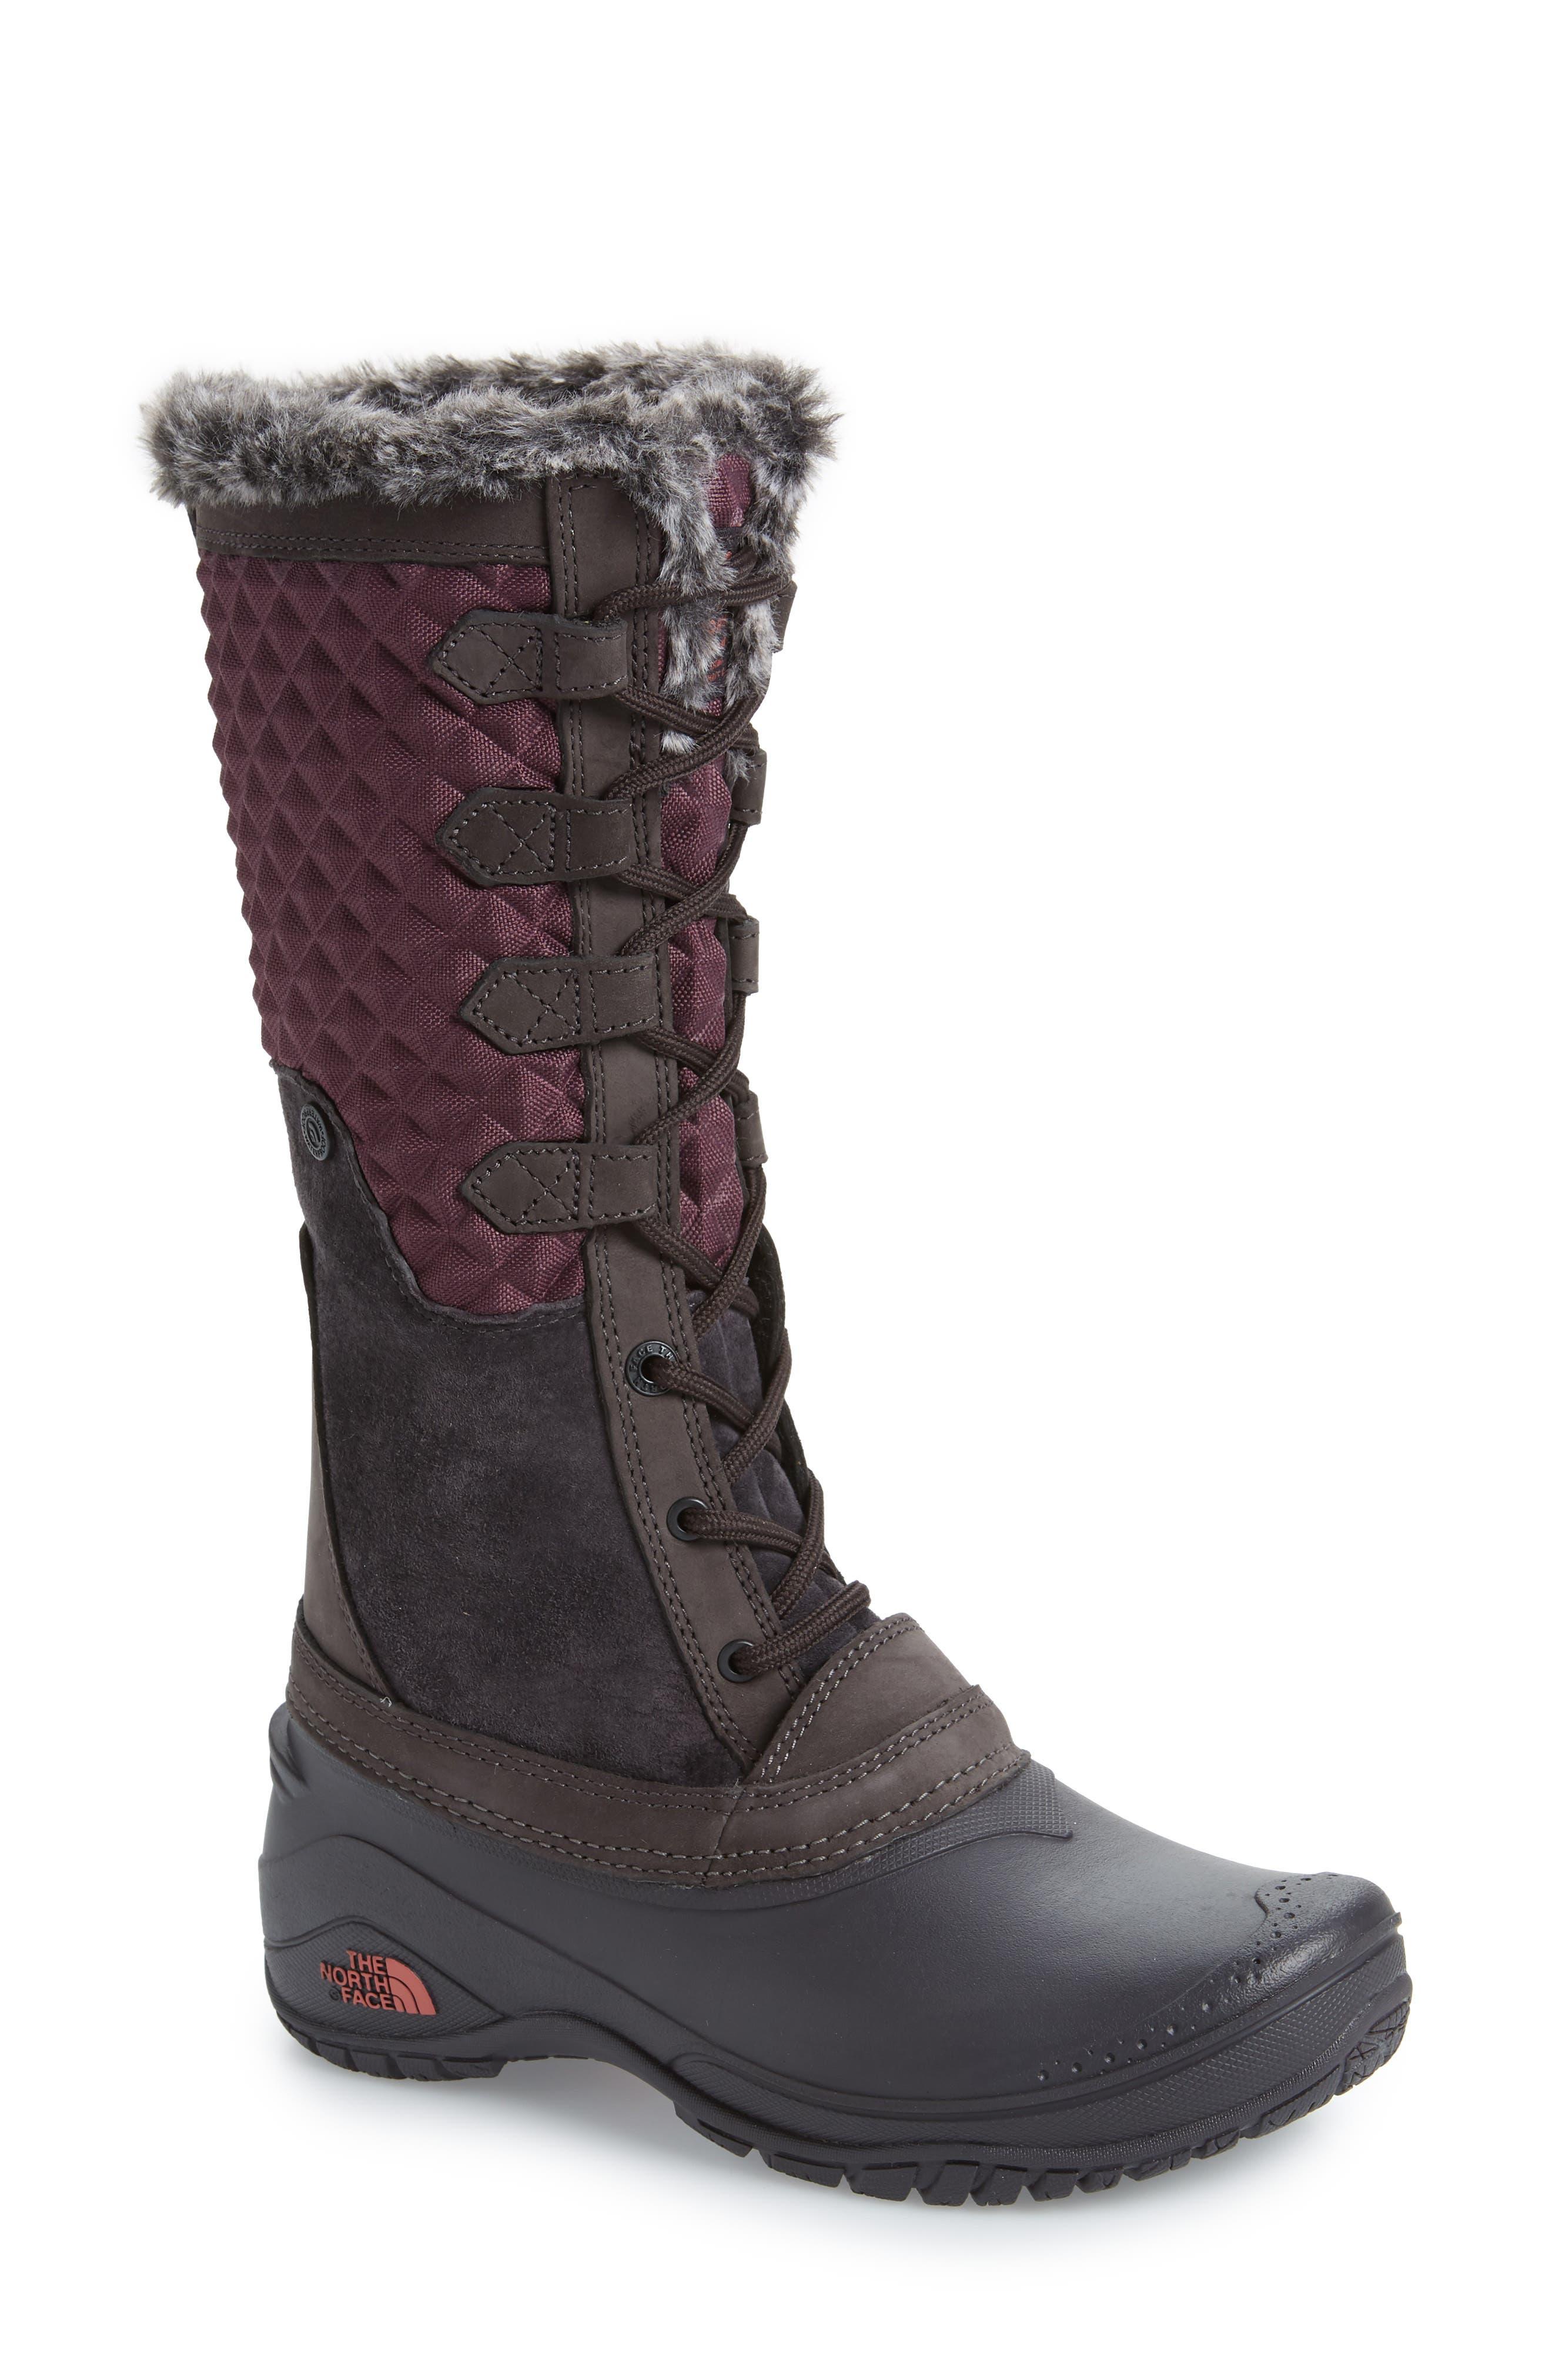 The North Face Shellista Iii Tall Waterproof Insulated Winter Boot, Burgundy